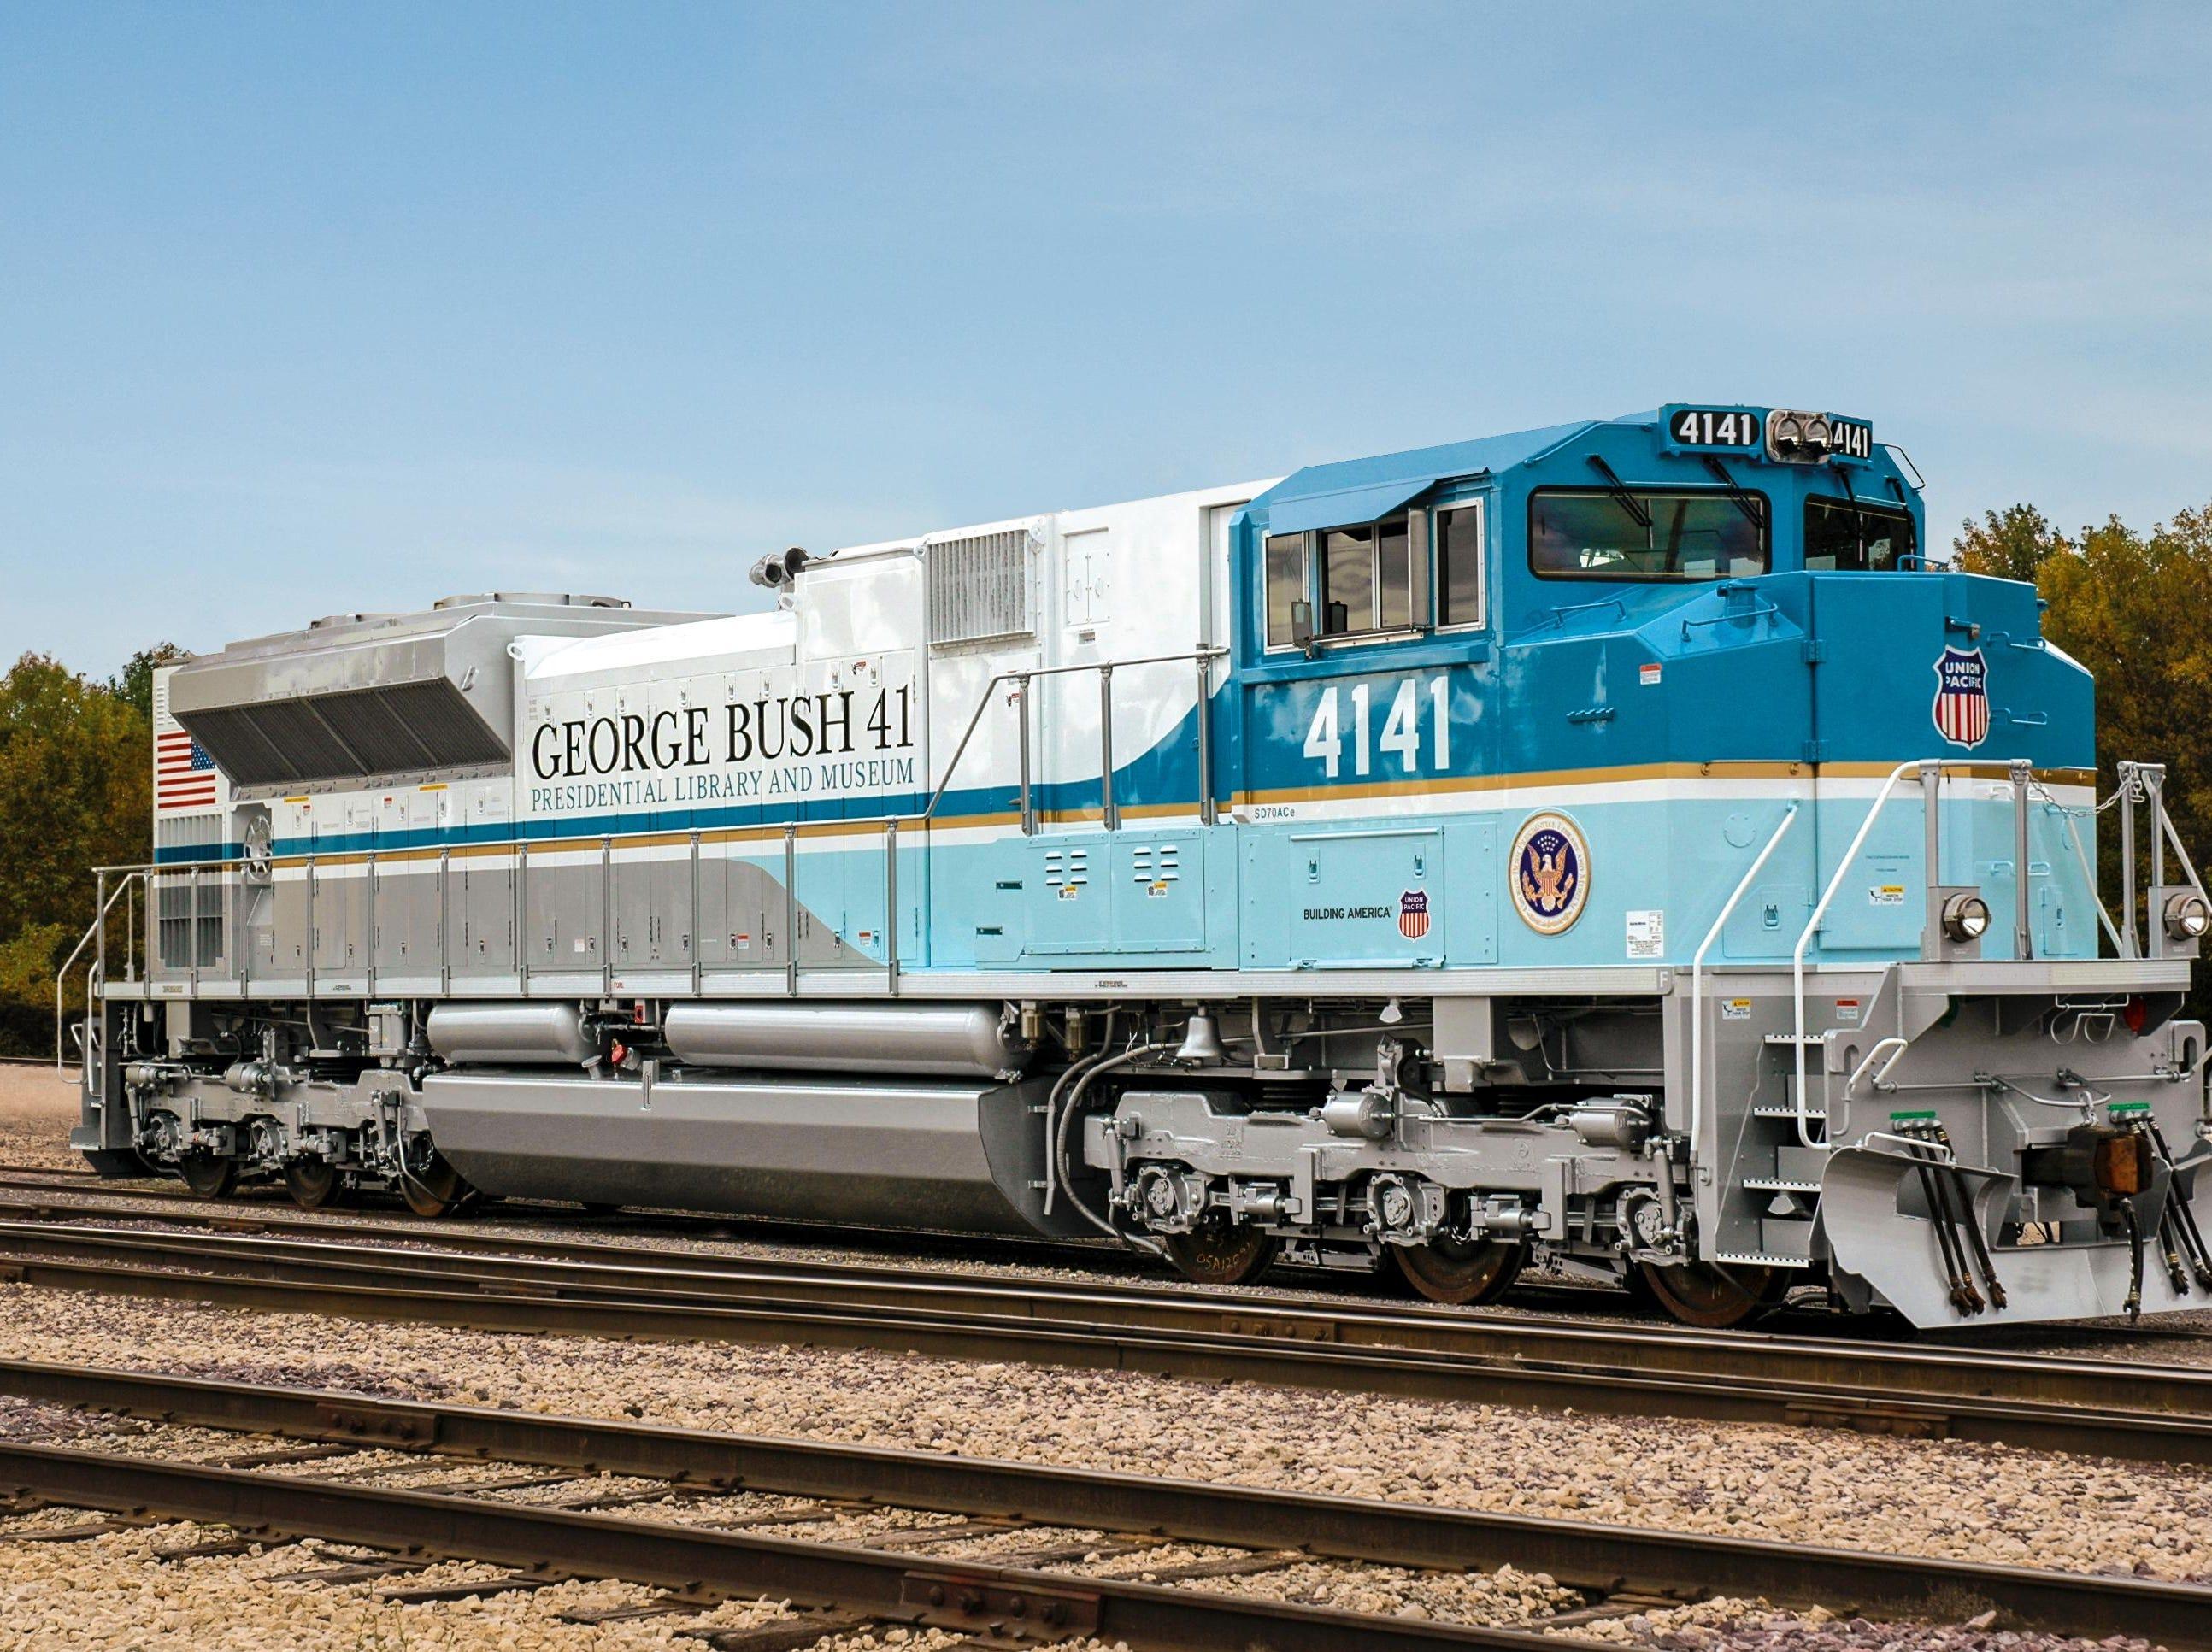 Union Pacific Locomotive No. 4141